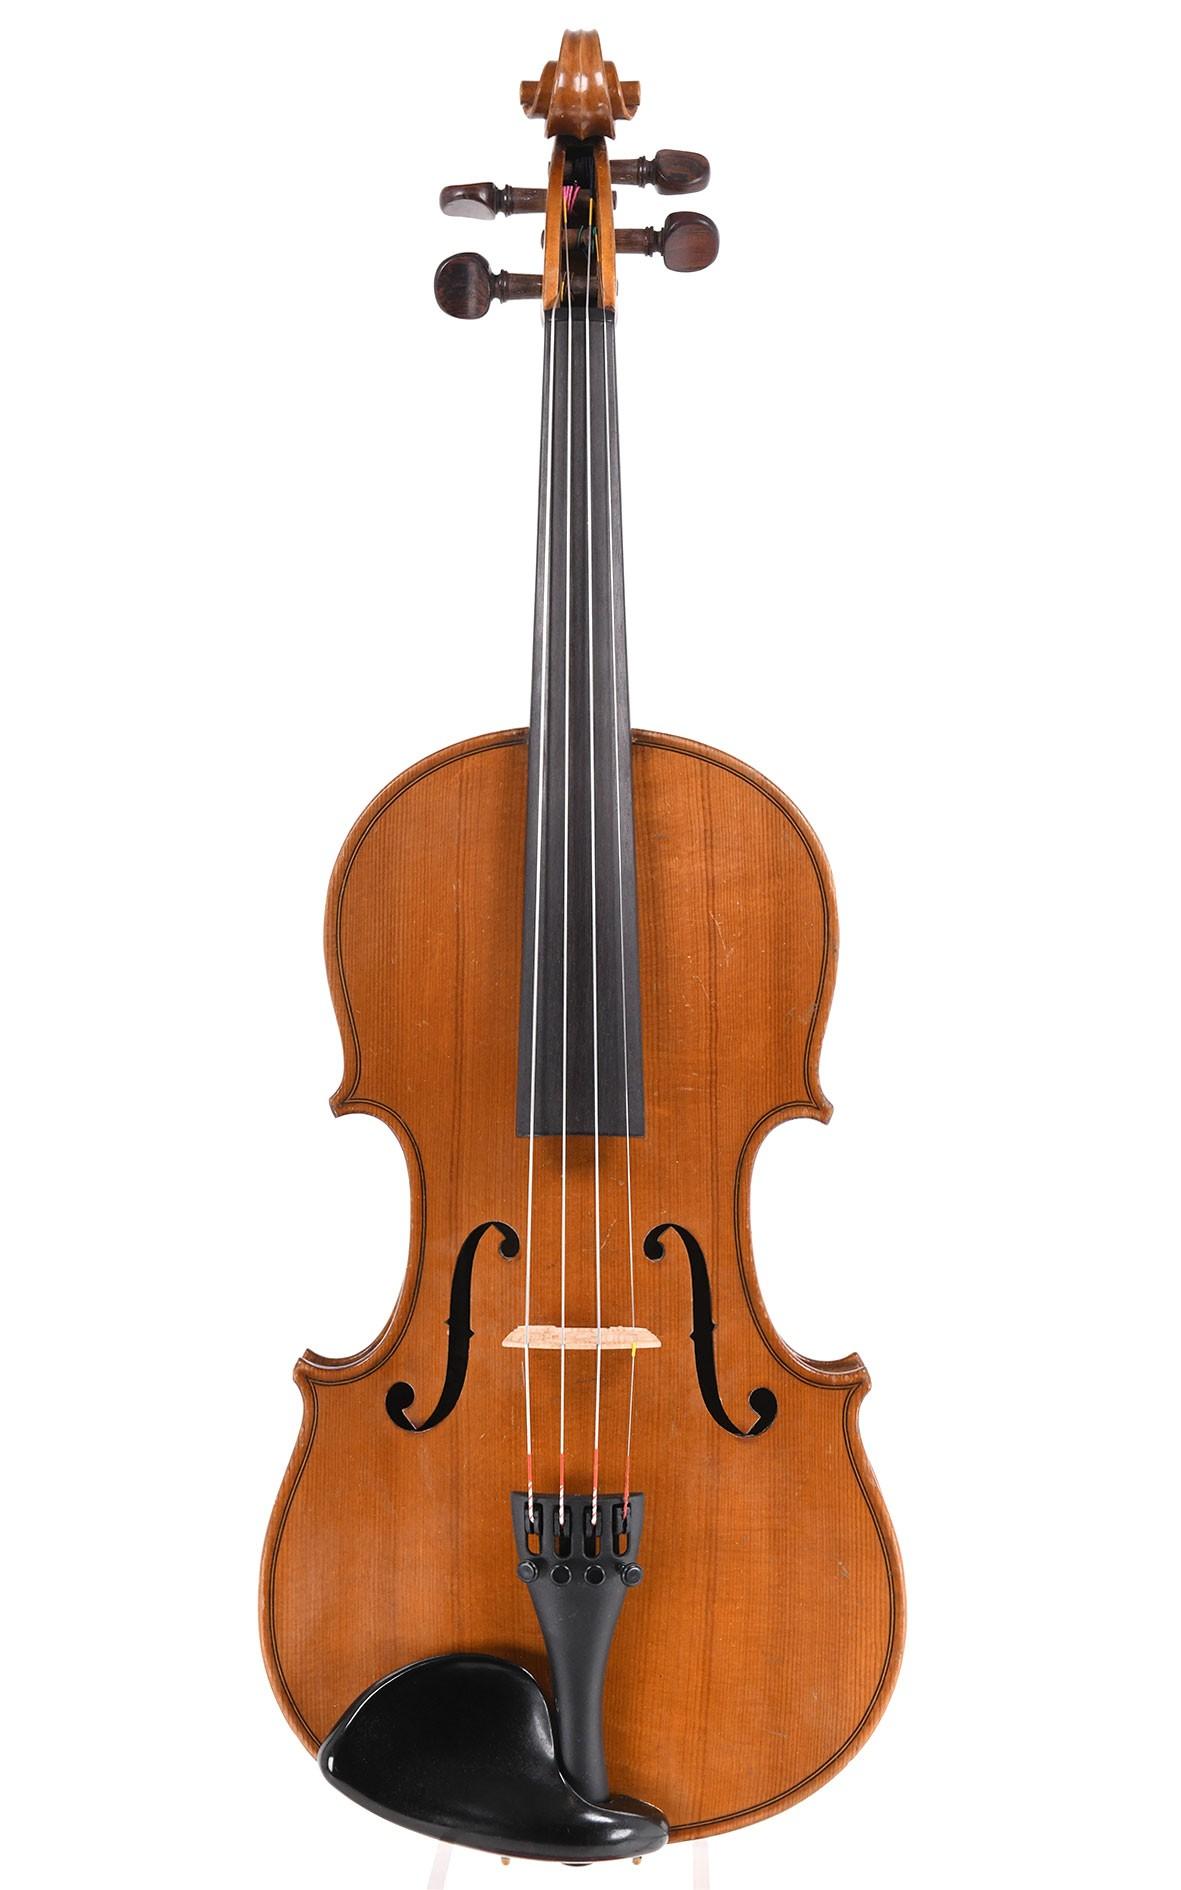 Antique French 3/4 violin from Mirecourt, Lutherie Masspacher